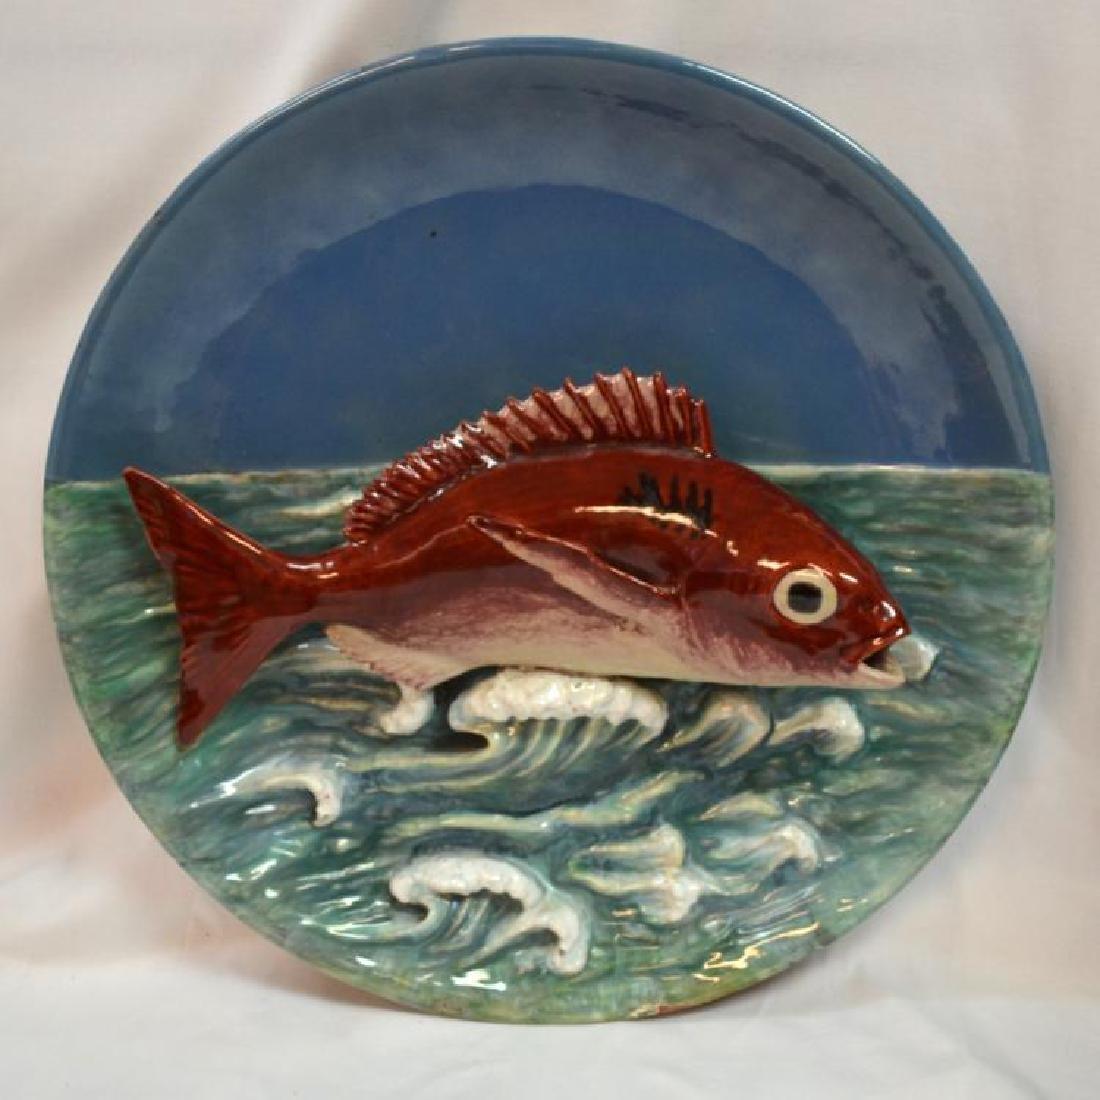 RARE ANTIQUE VERY LARGE PORTUGUSE MAJOLICA FISH PLATE